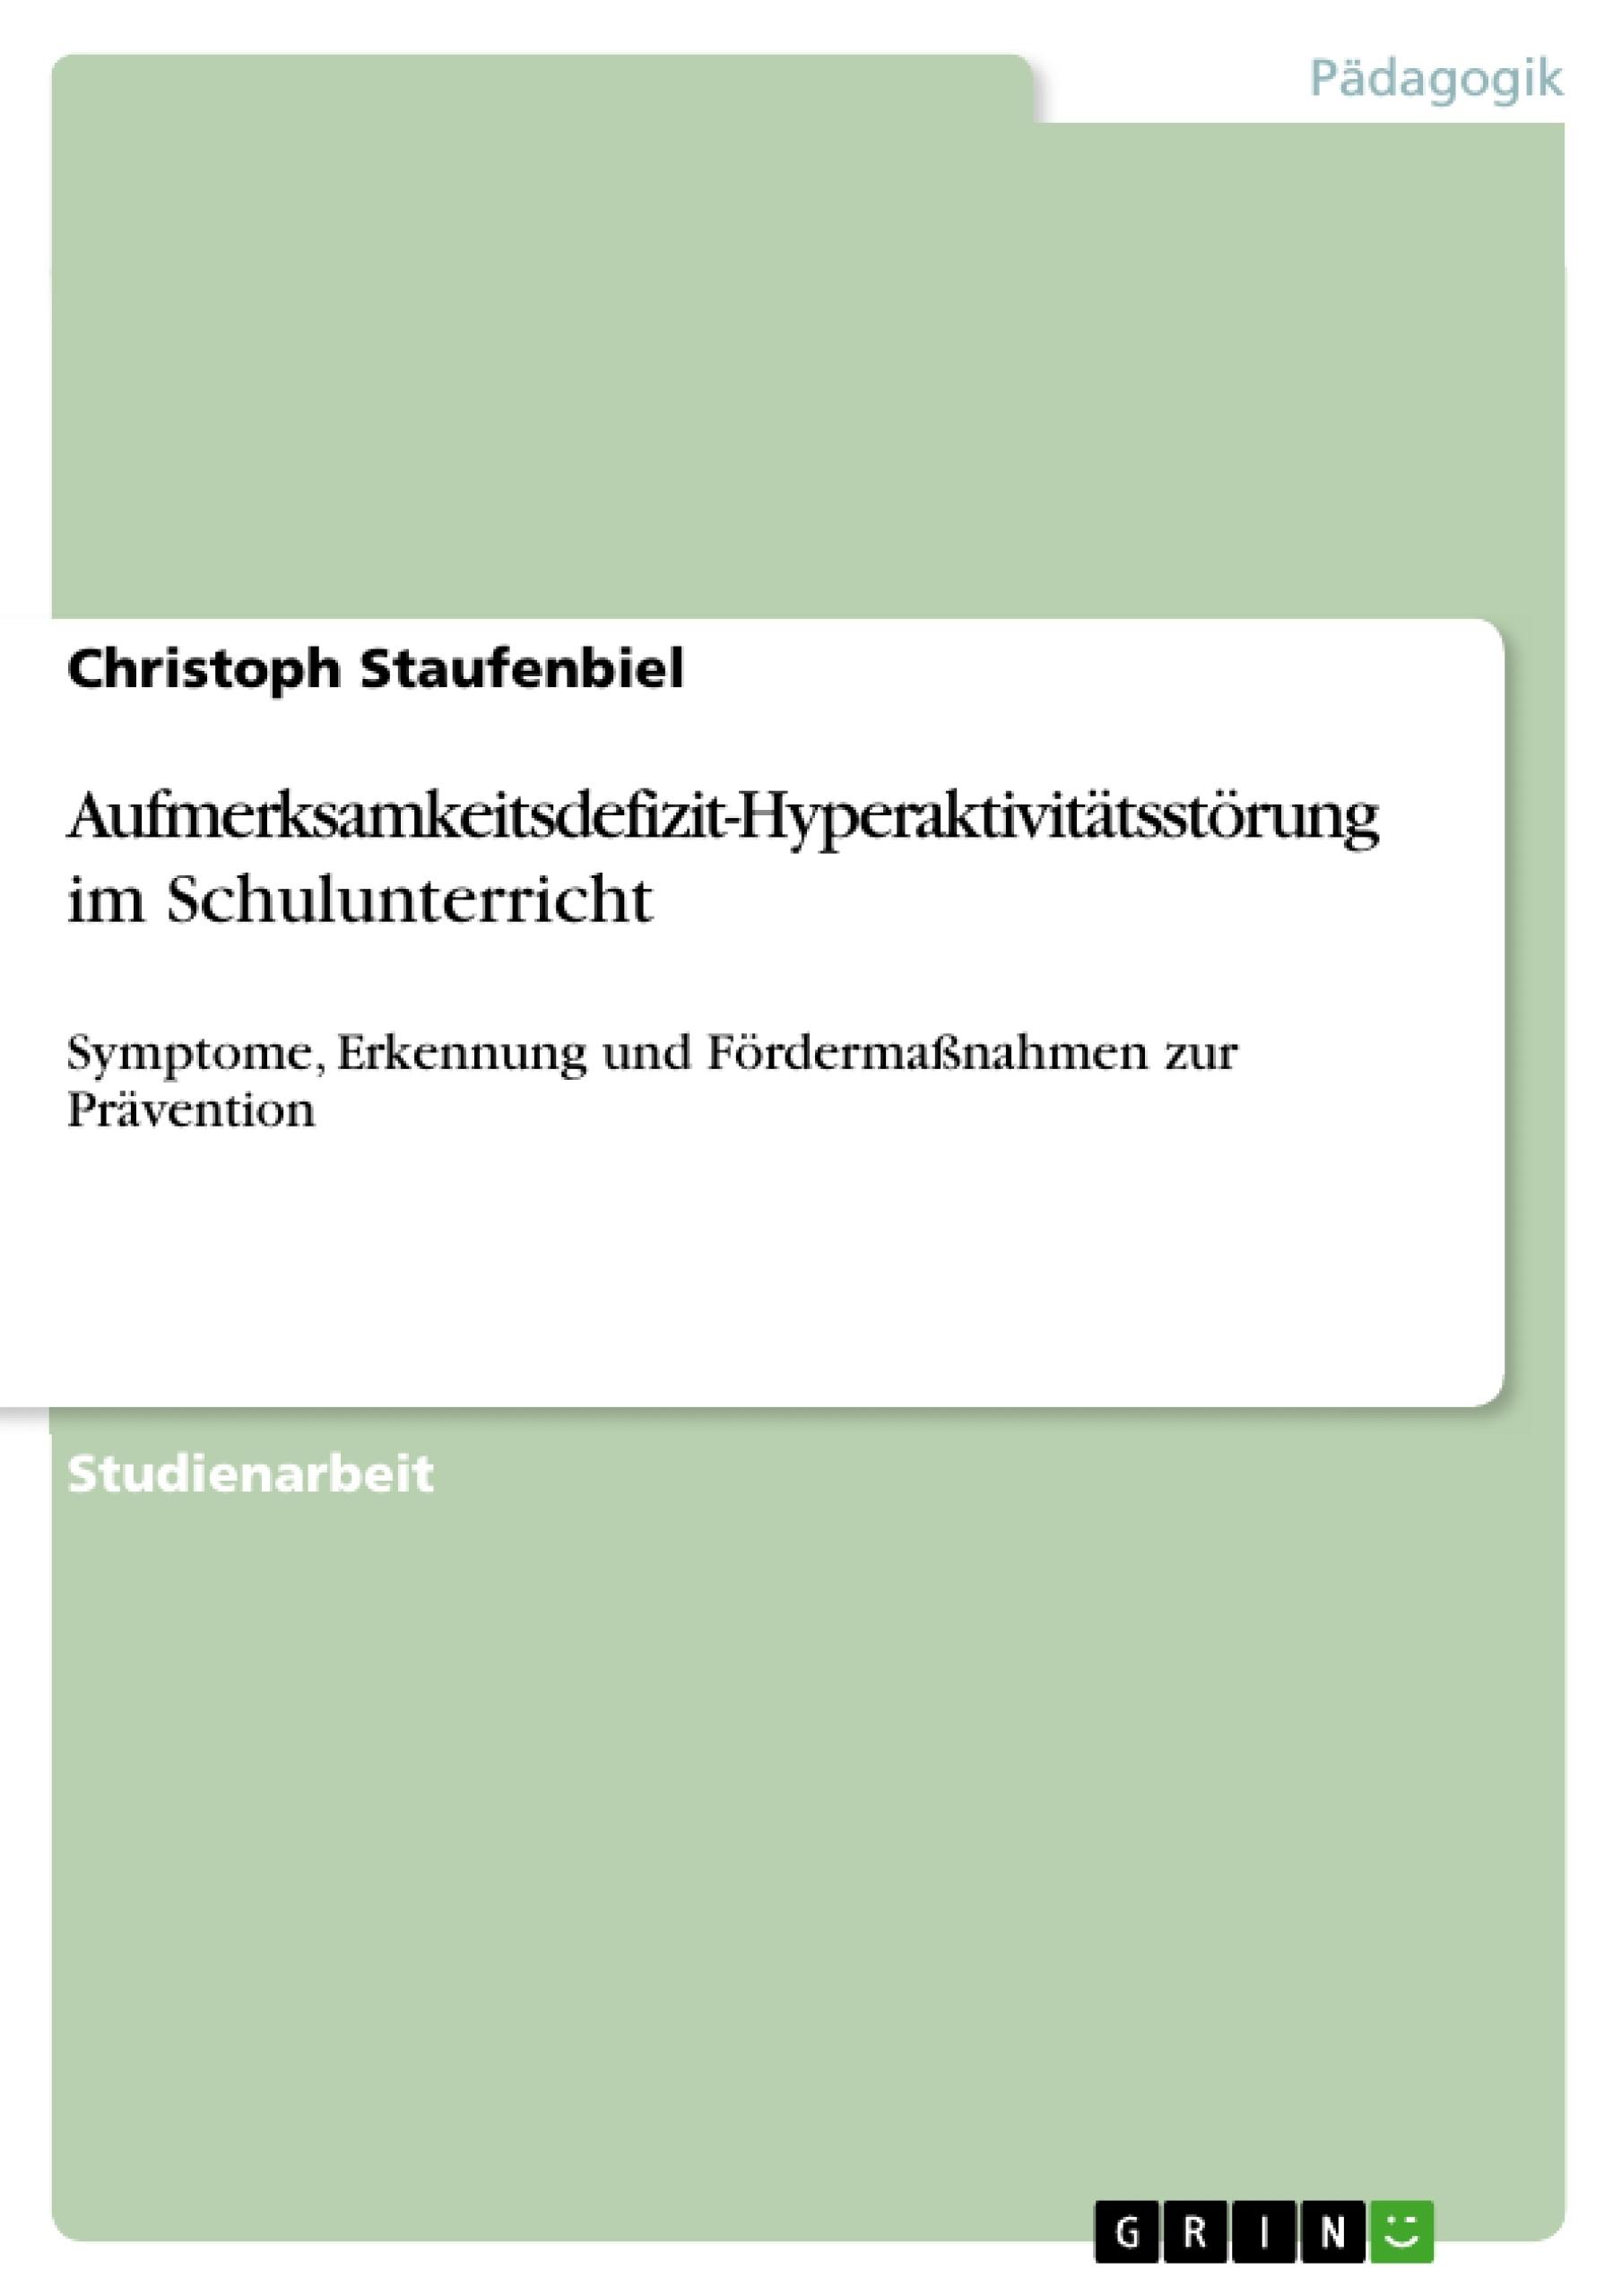 Titel: Aufmerksamkeitsdefizit-Hyperaktivitätsstörung im Schulunterricht